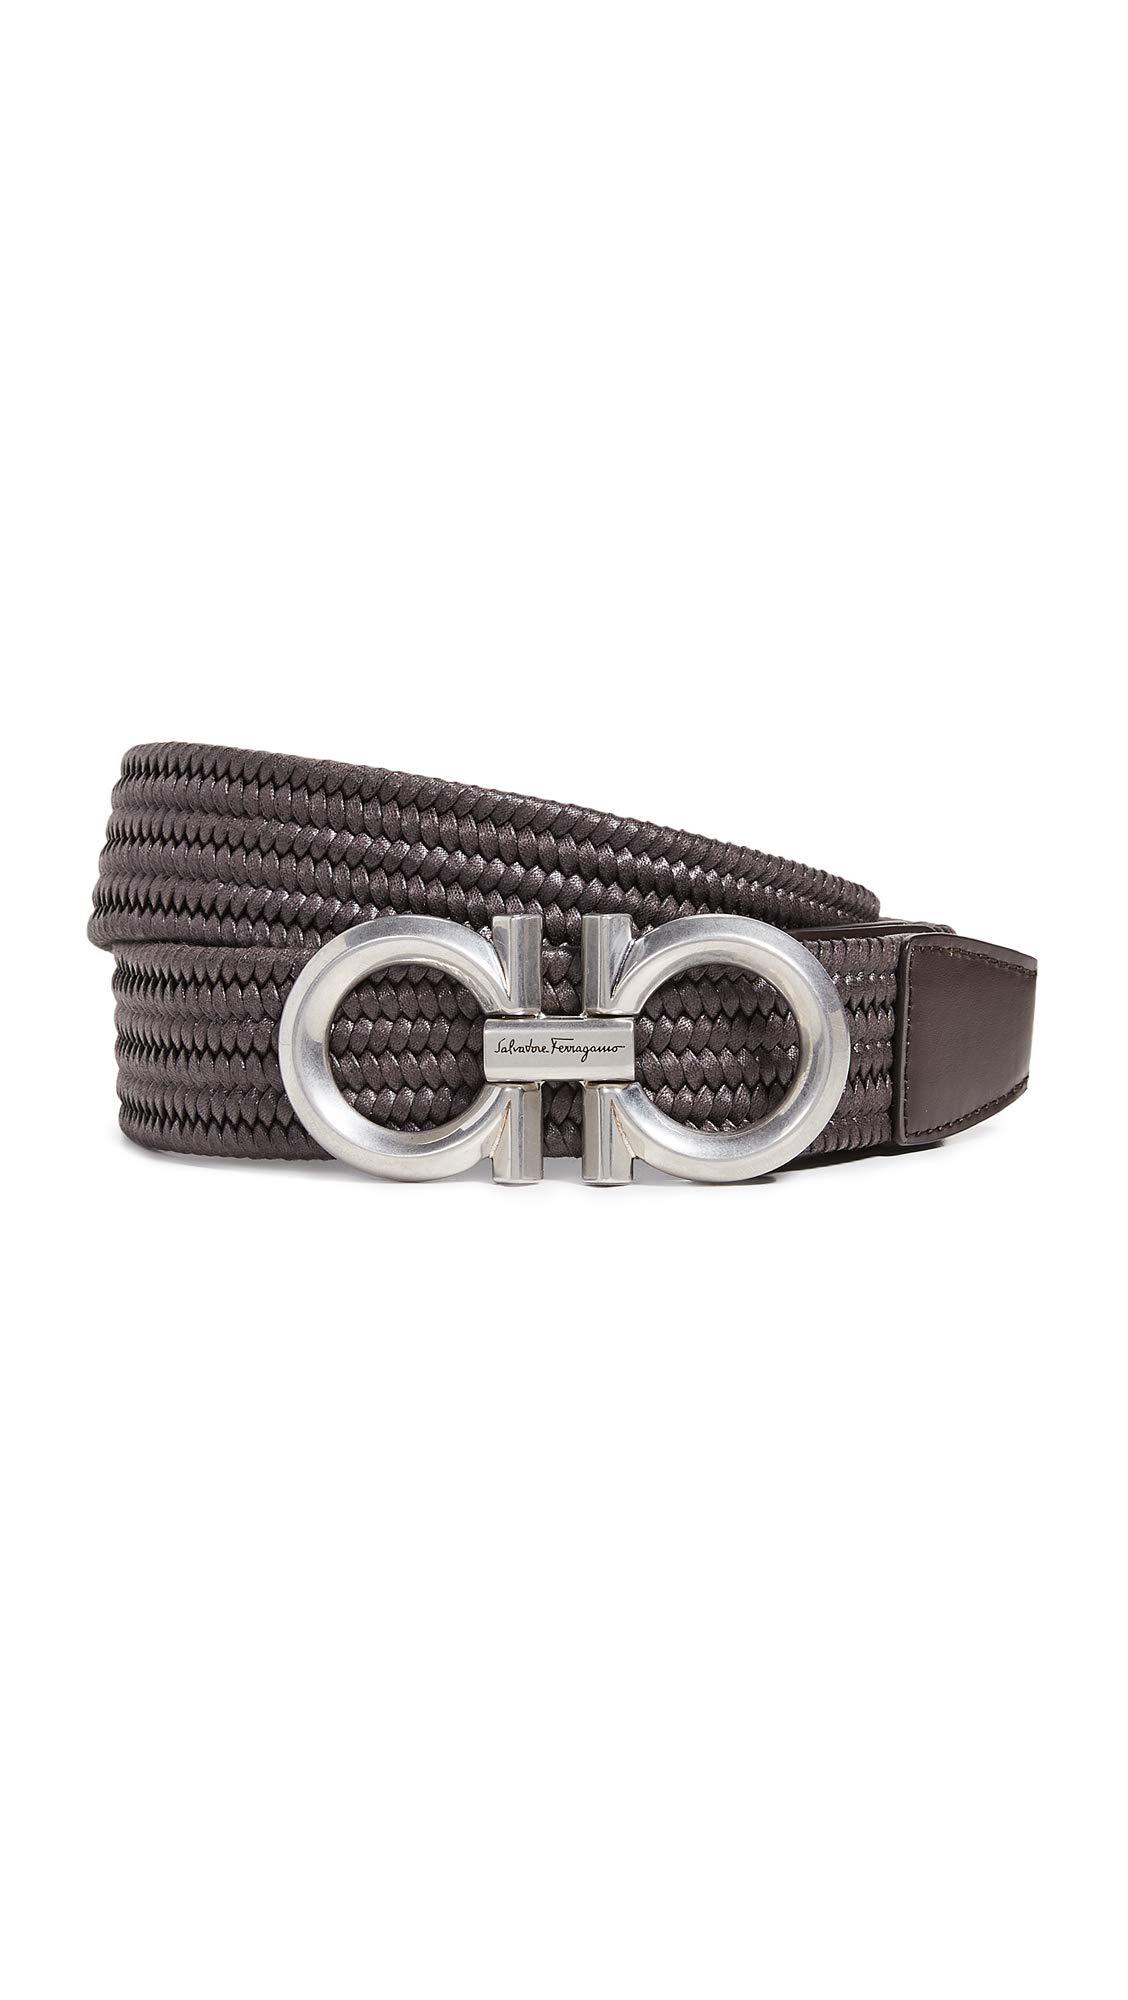 Salvatore Ferragamo Men's Braided Double Gancini Stretch Belt, Brown, 36